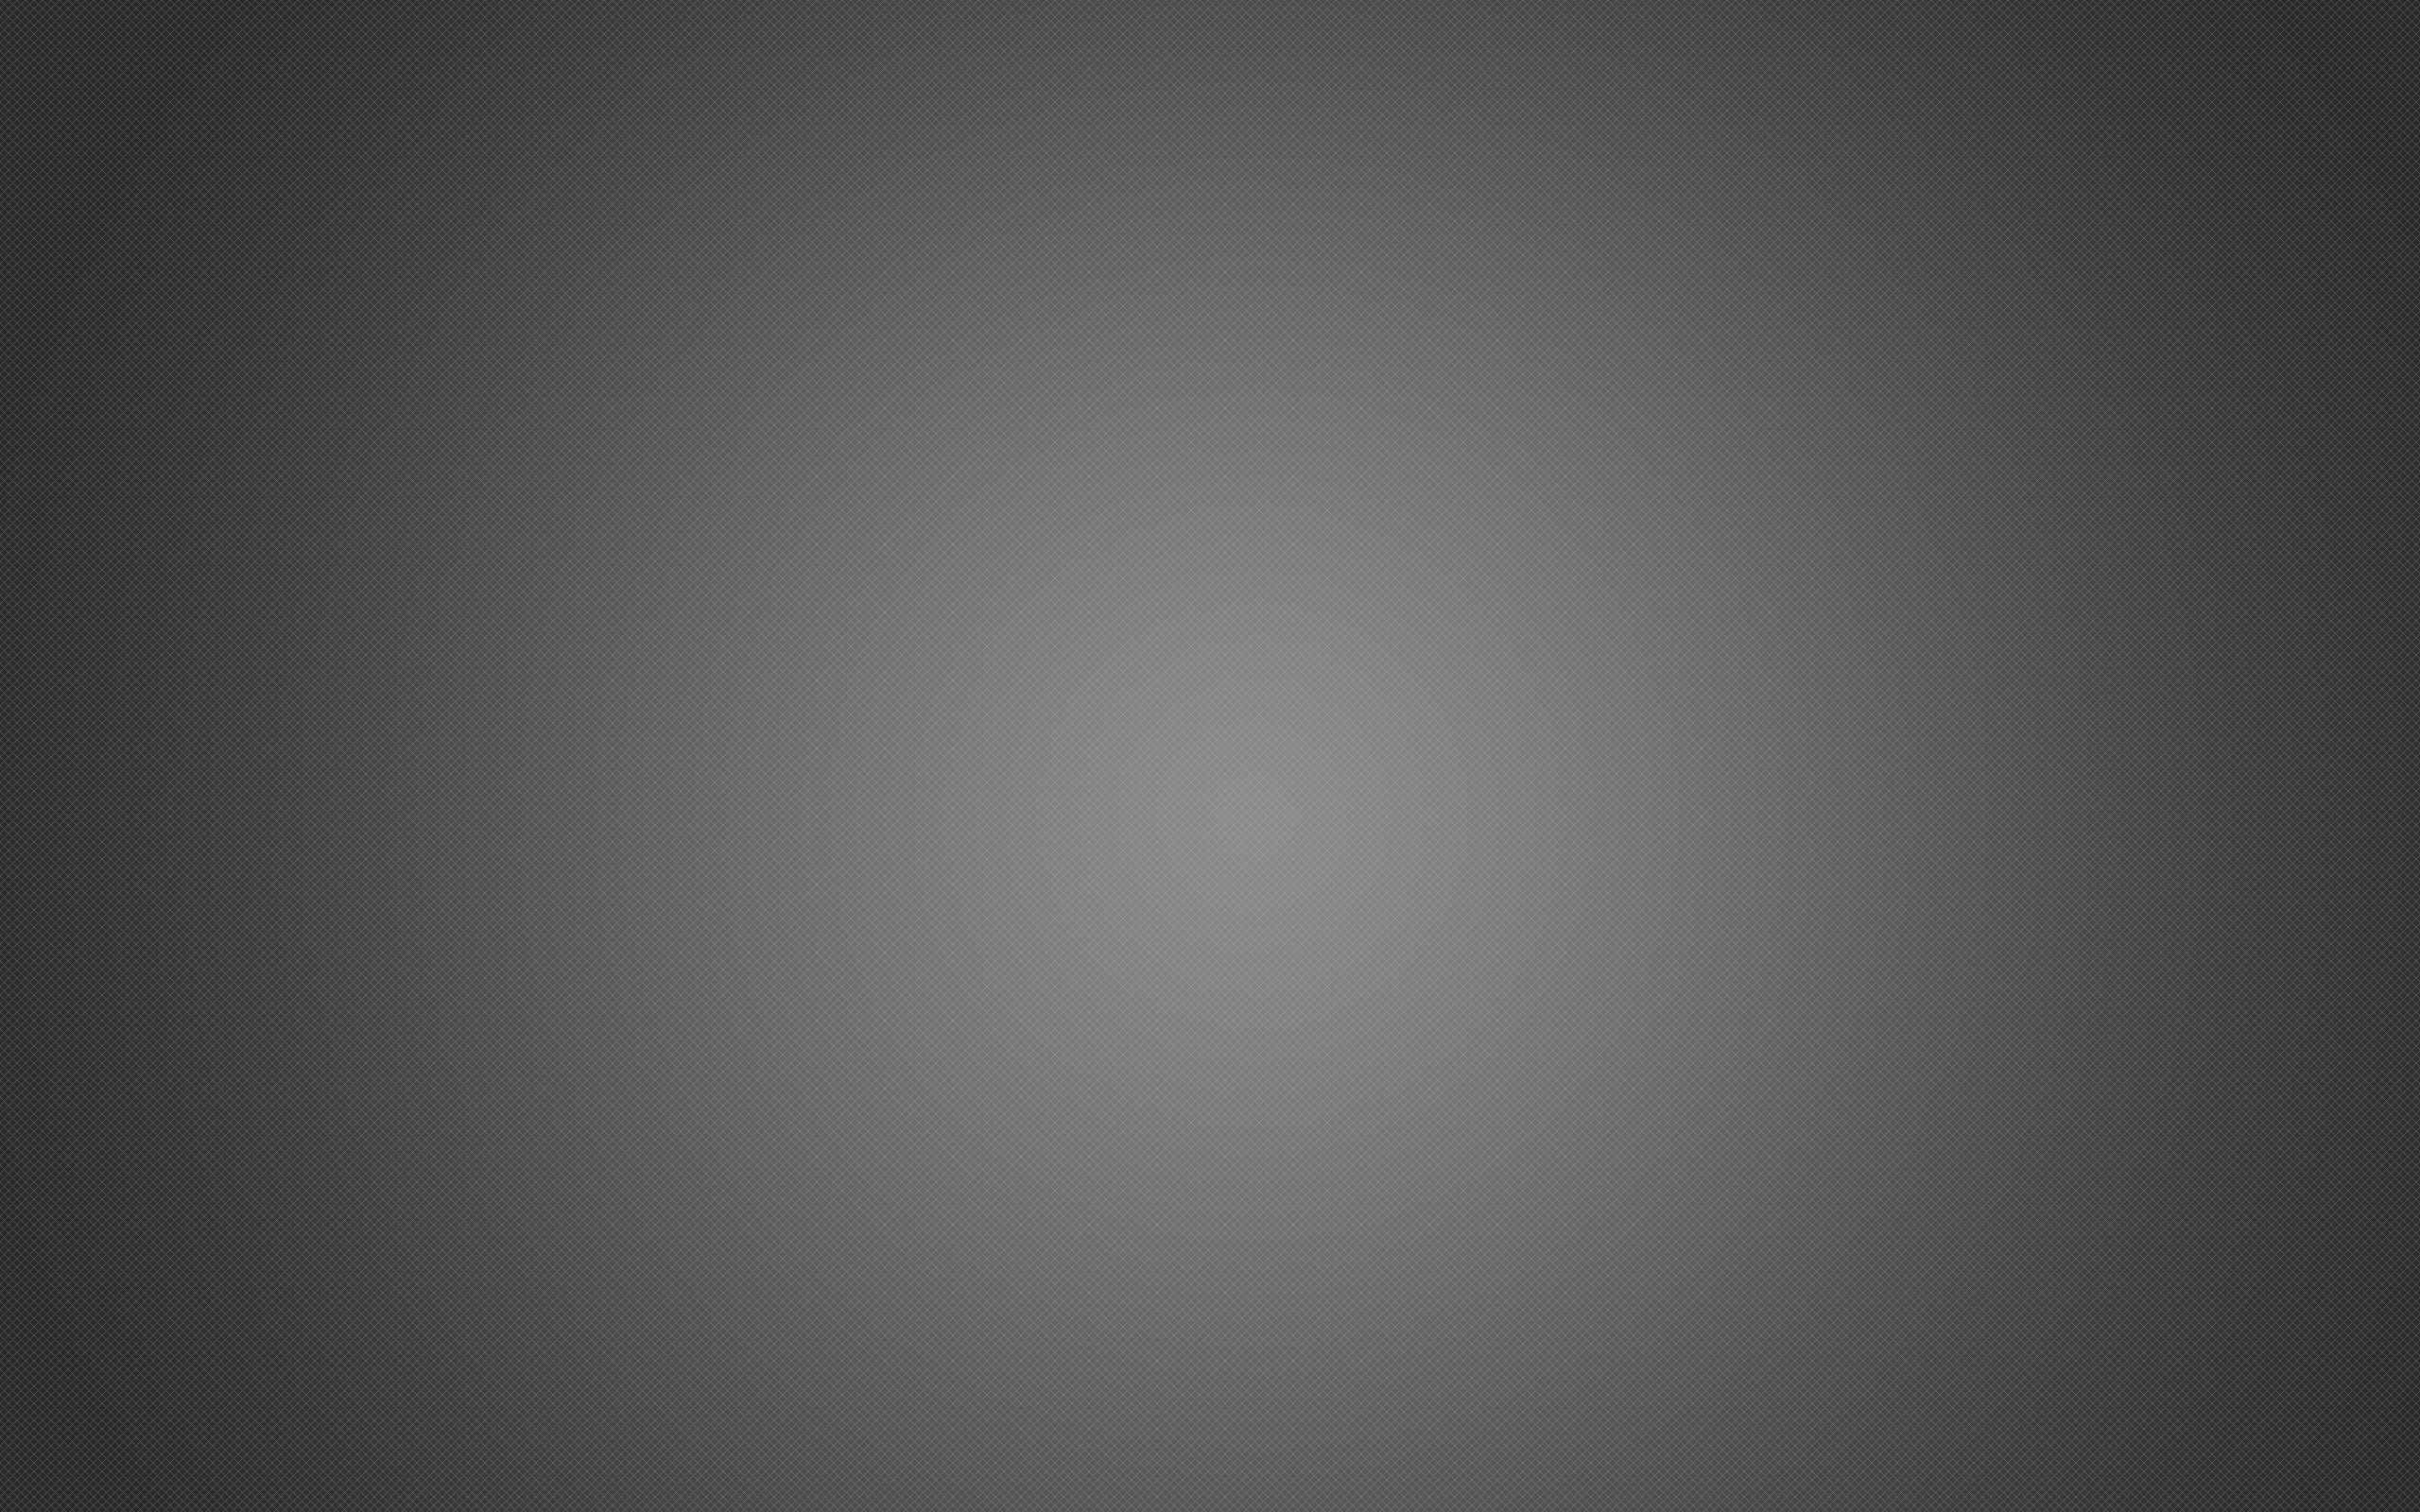 Dark-Grey-Background-Best-Wallpaper-Gallery-dji6x-Free